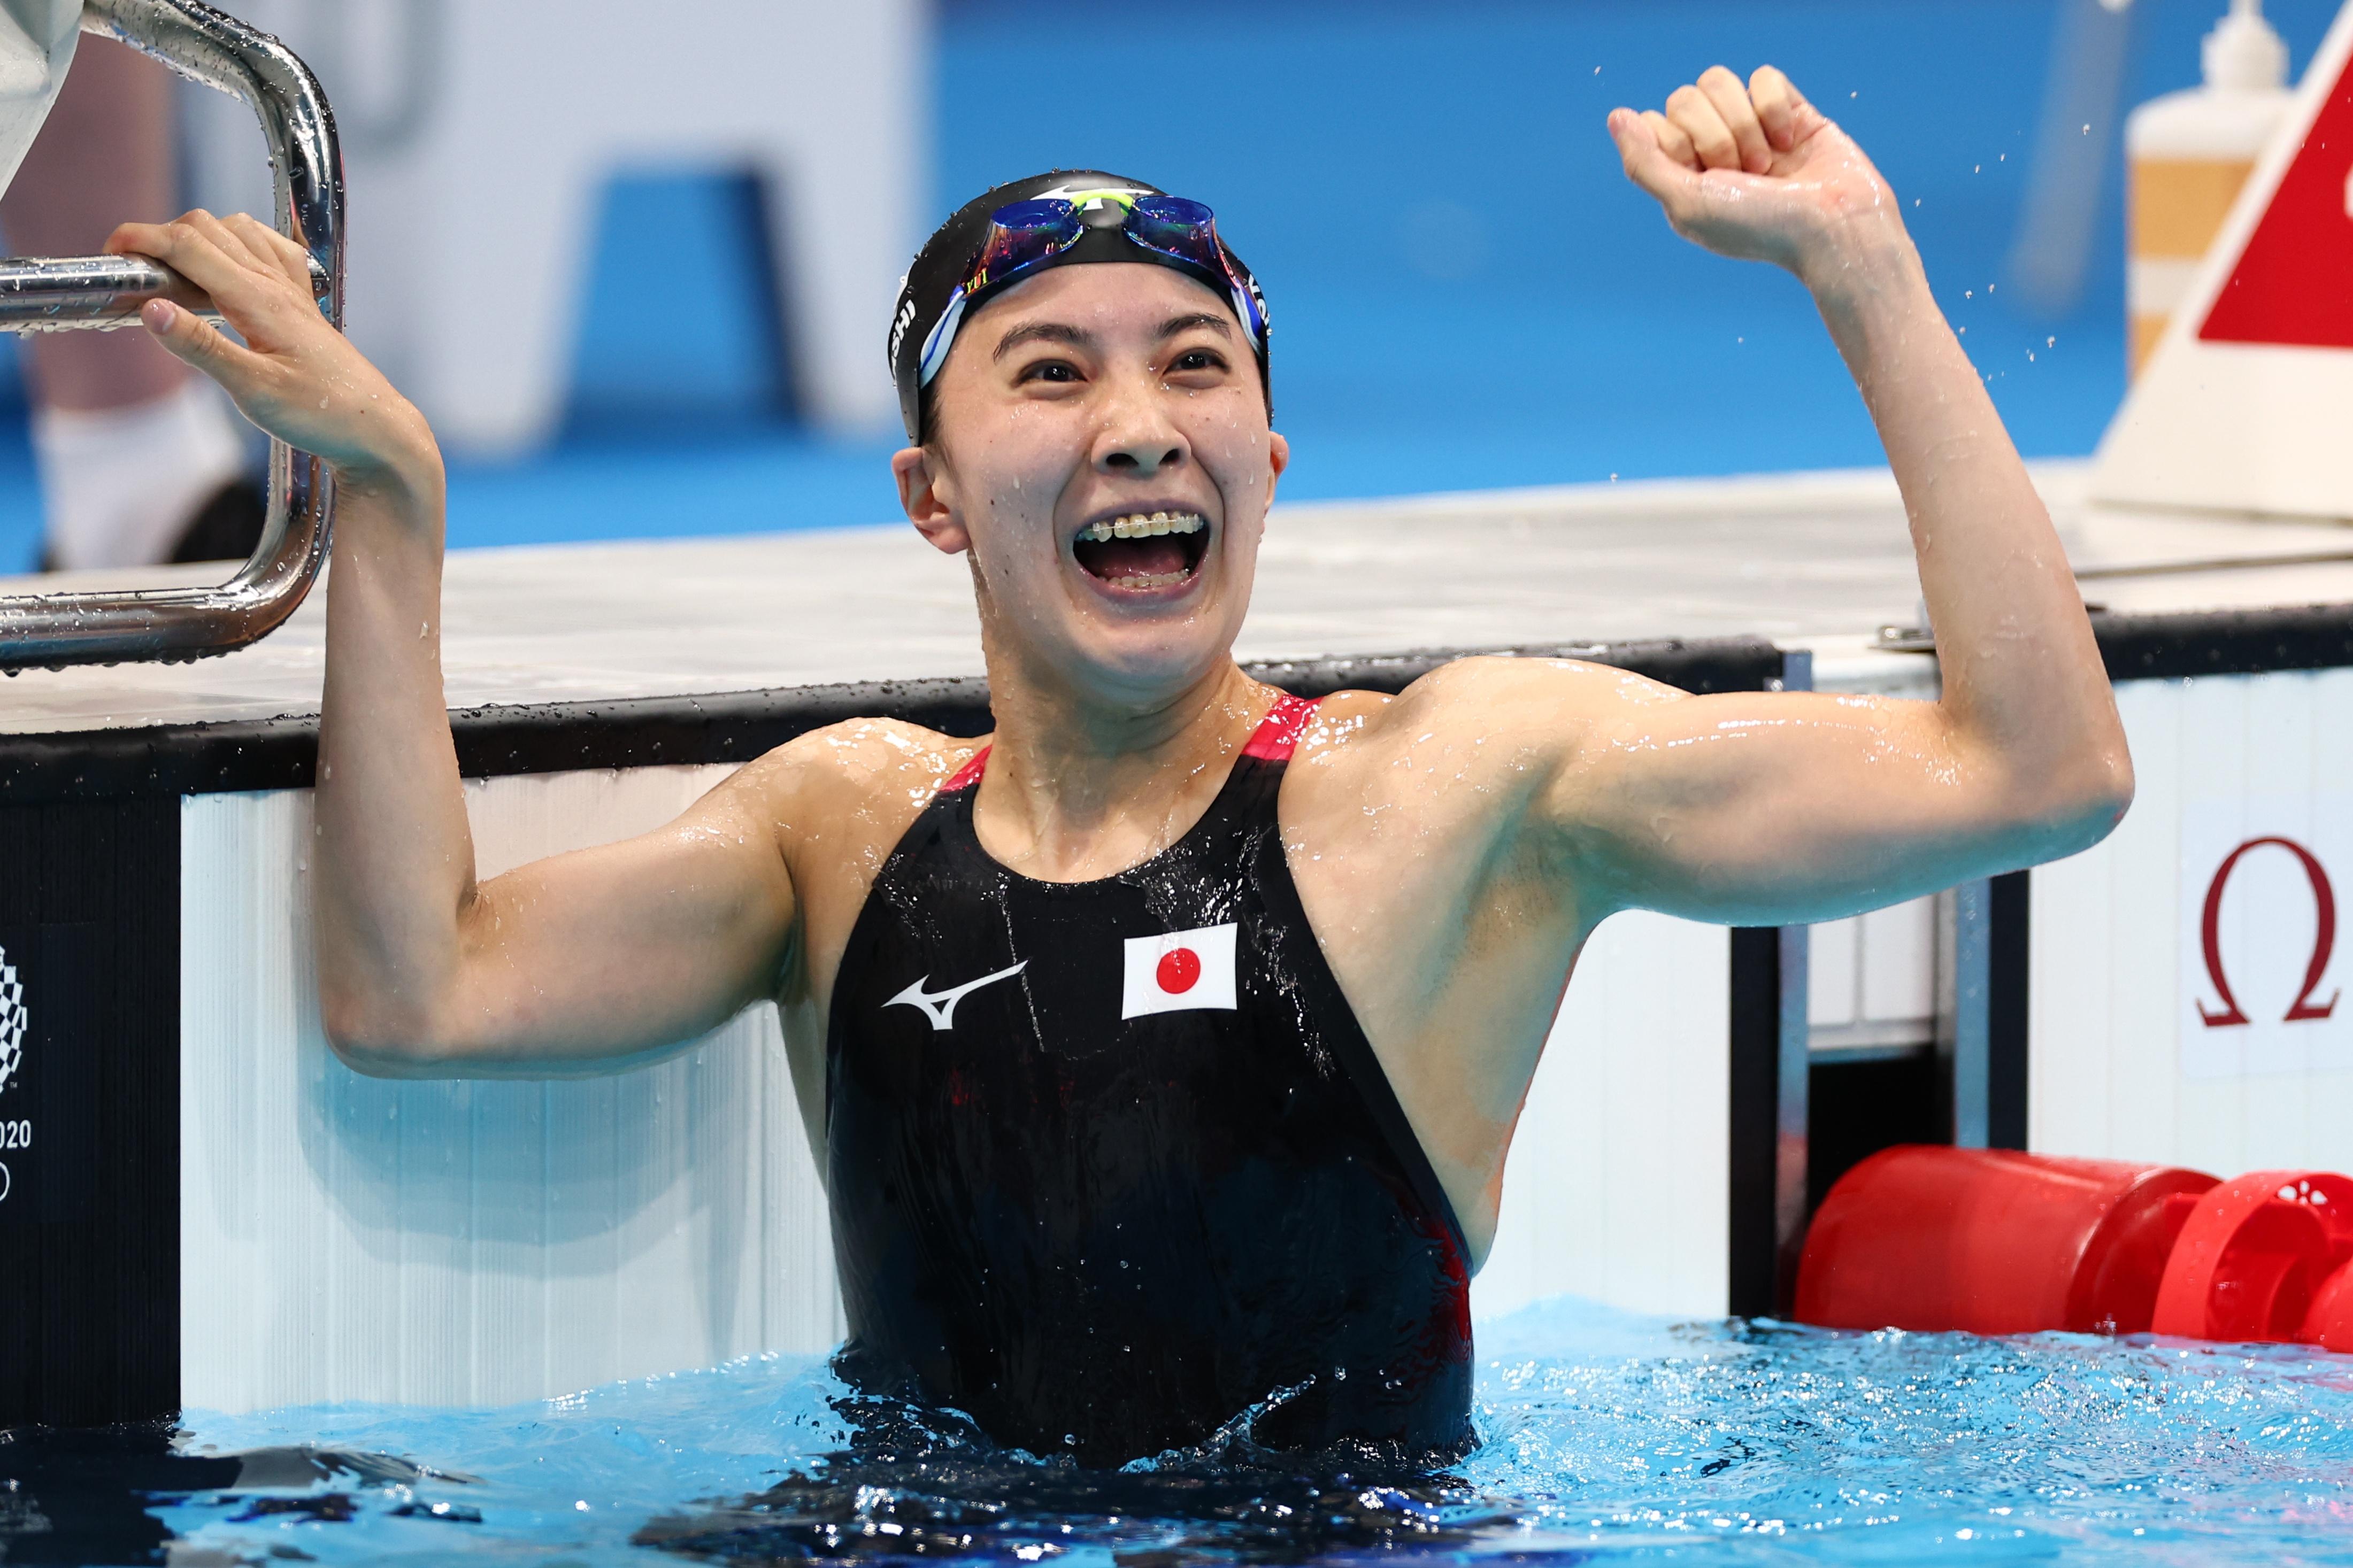 Tokyo 2020 Olympics - Swimming - Women's 400m Individual Medley - Final - Tokyo Aquatics Centre - Tokyo, Japan - July 25, 2021. Yui Ohashi of Japan celebrates after winning the gold medal REUTERS/Kai Pfaffenbach